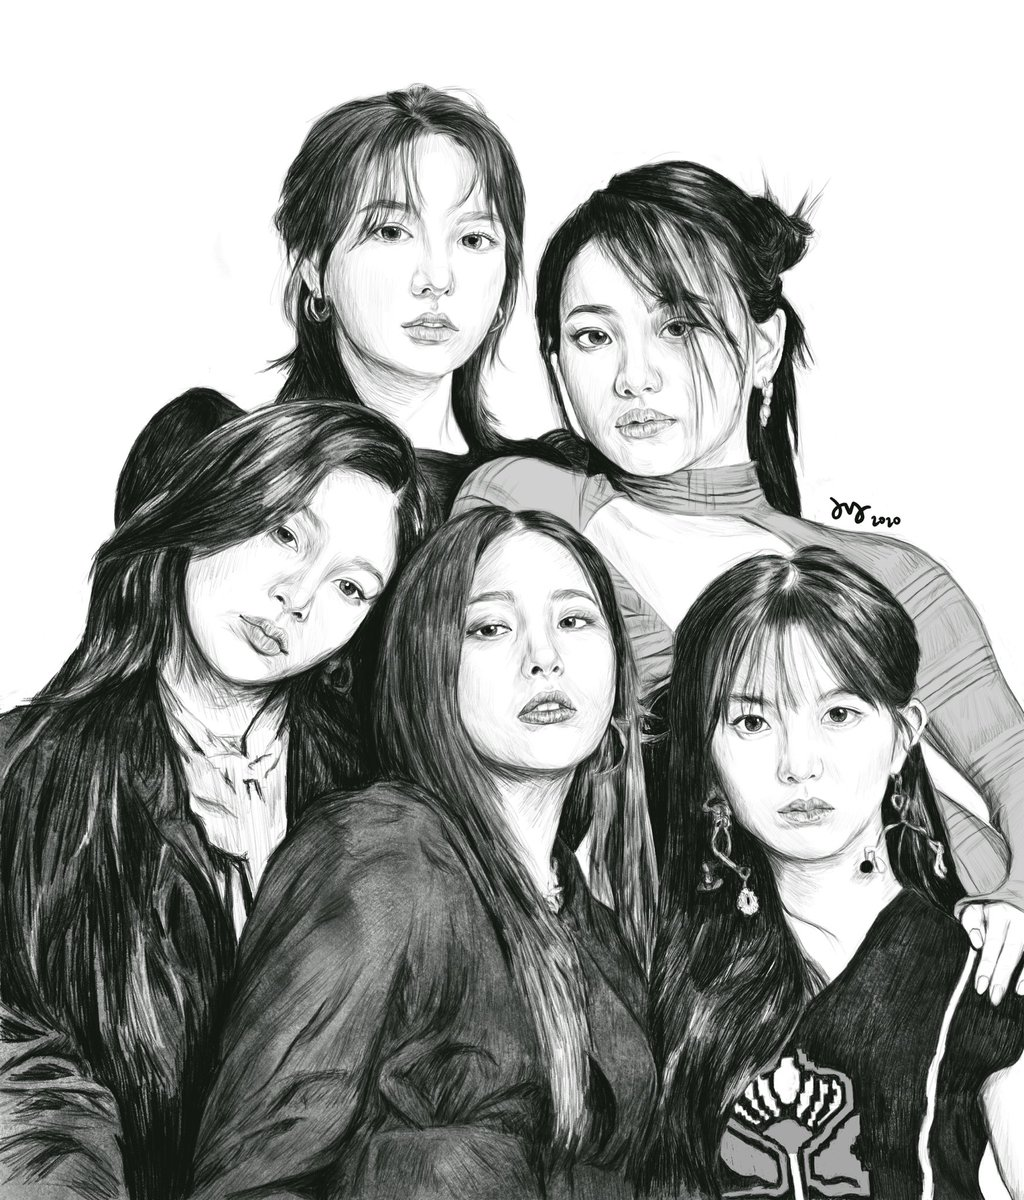 💗💛💙💚💜 #Irene #Seulgi #Wendy #Joy #Yeri #RedVelvet #아이린 #슬기 #웬디 #조이 #예리 #redvelvetfanart